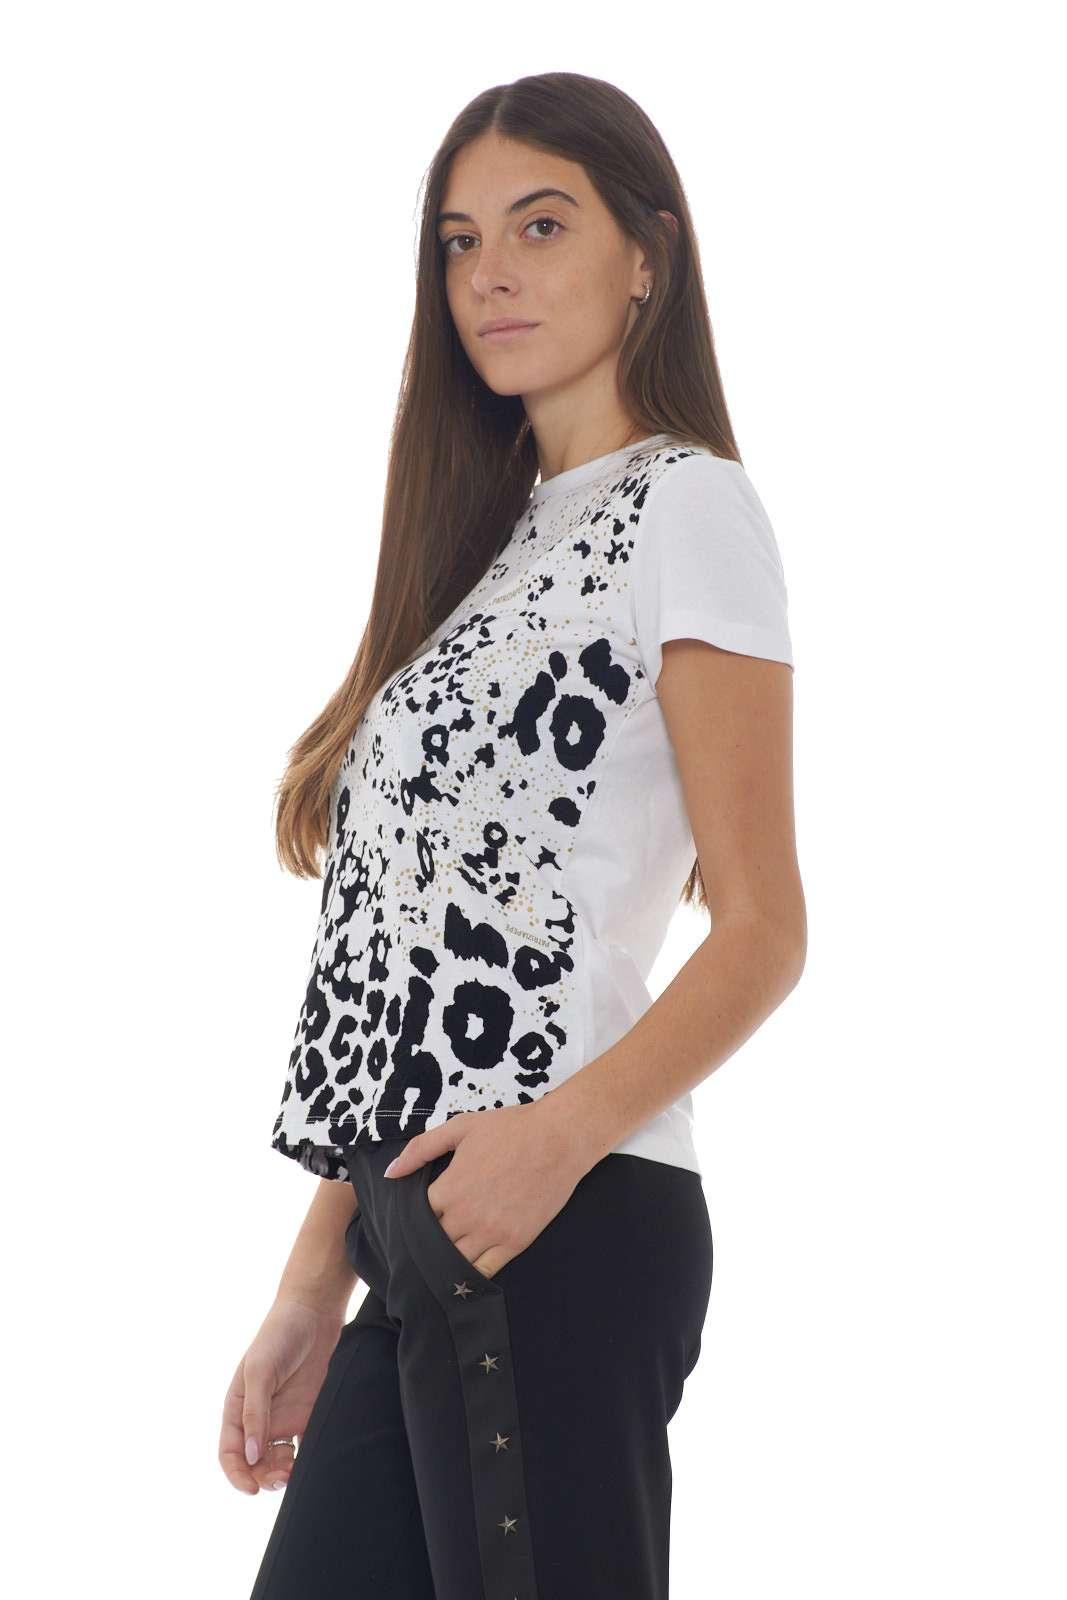 https://www.parmax.com/media/catalog/product/a/i/AI-outlet_parmax-t-shirt-donna-Patrizia-Pepe-2M3819-B.jpg